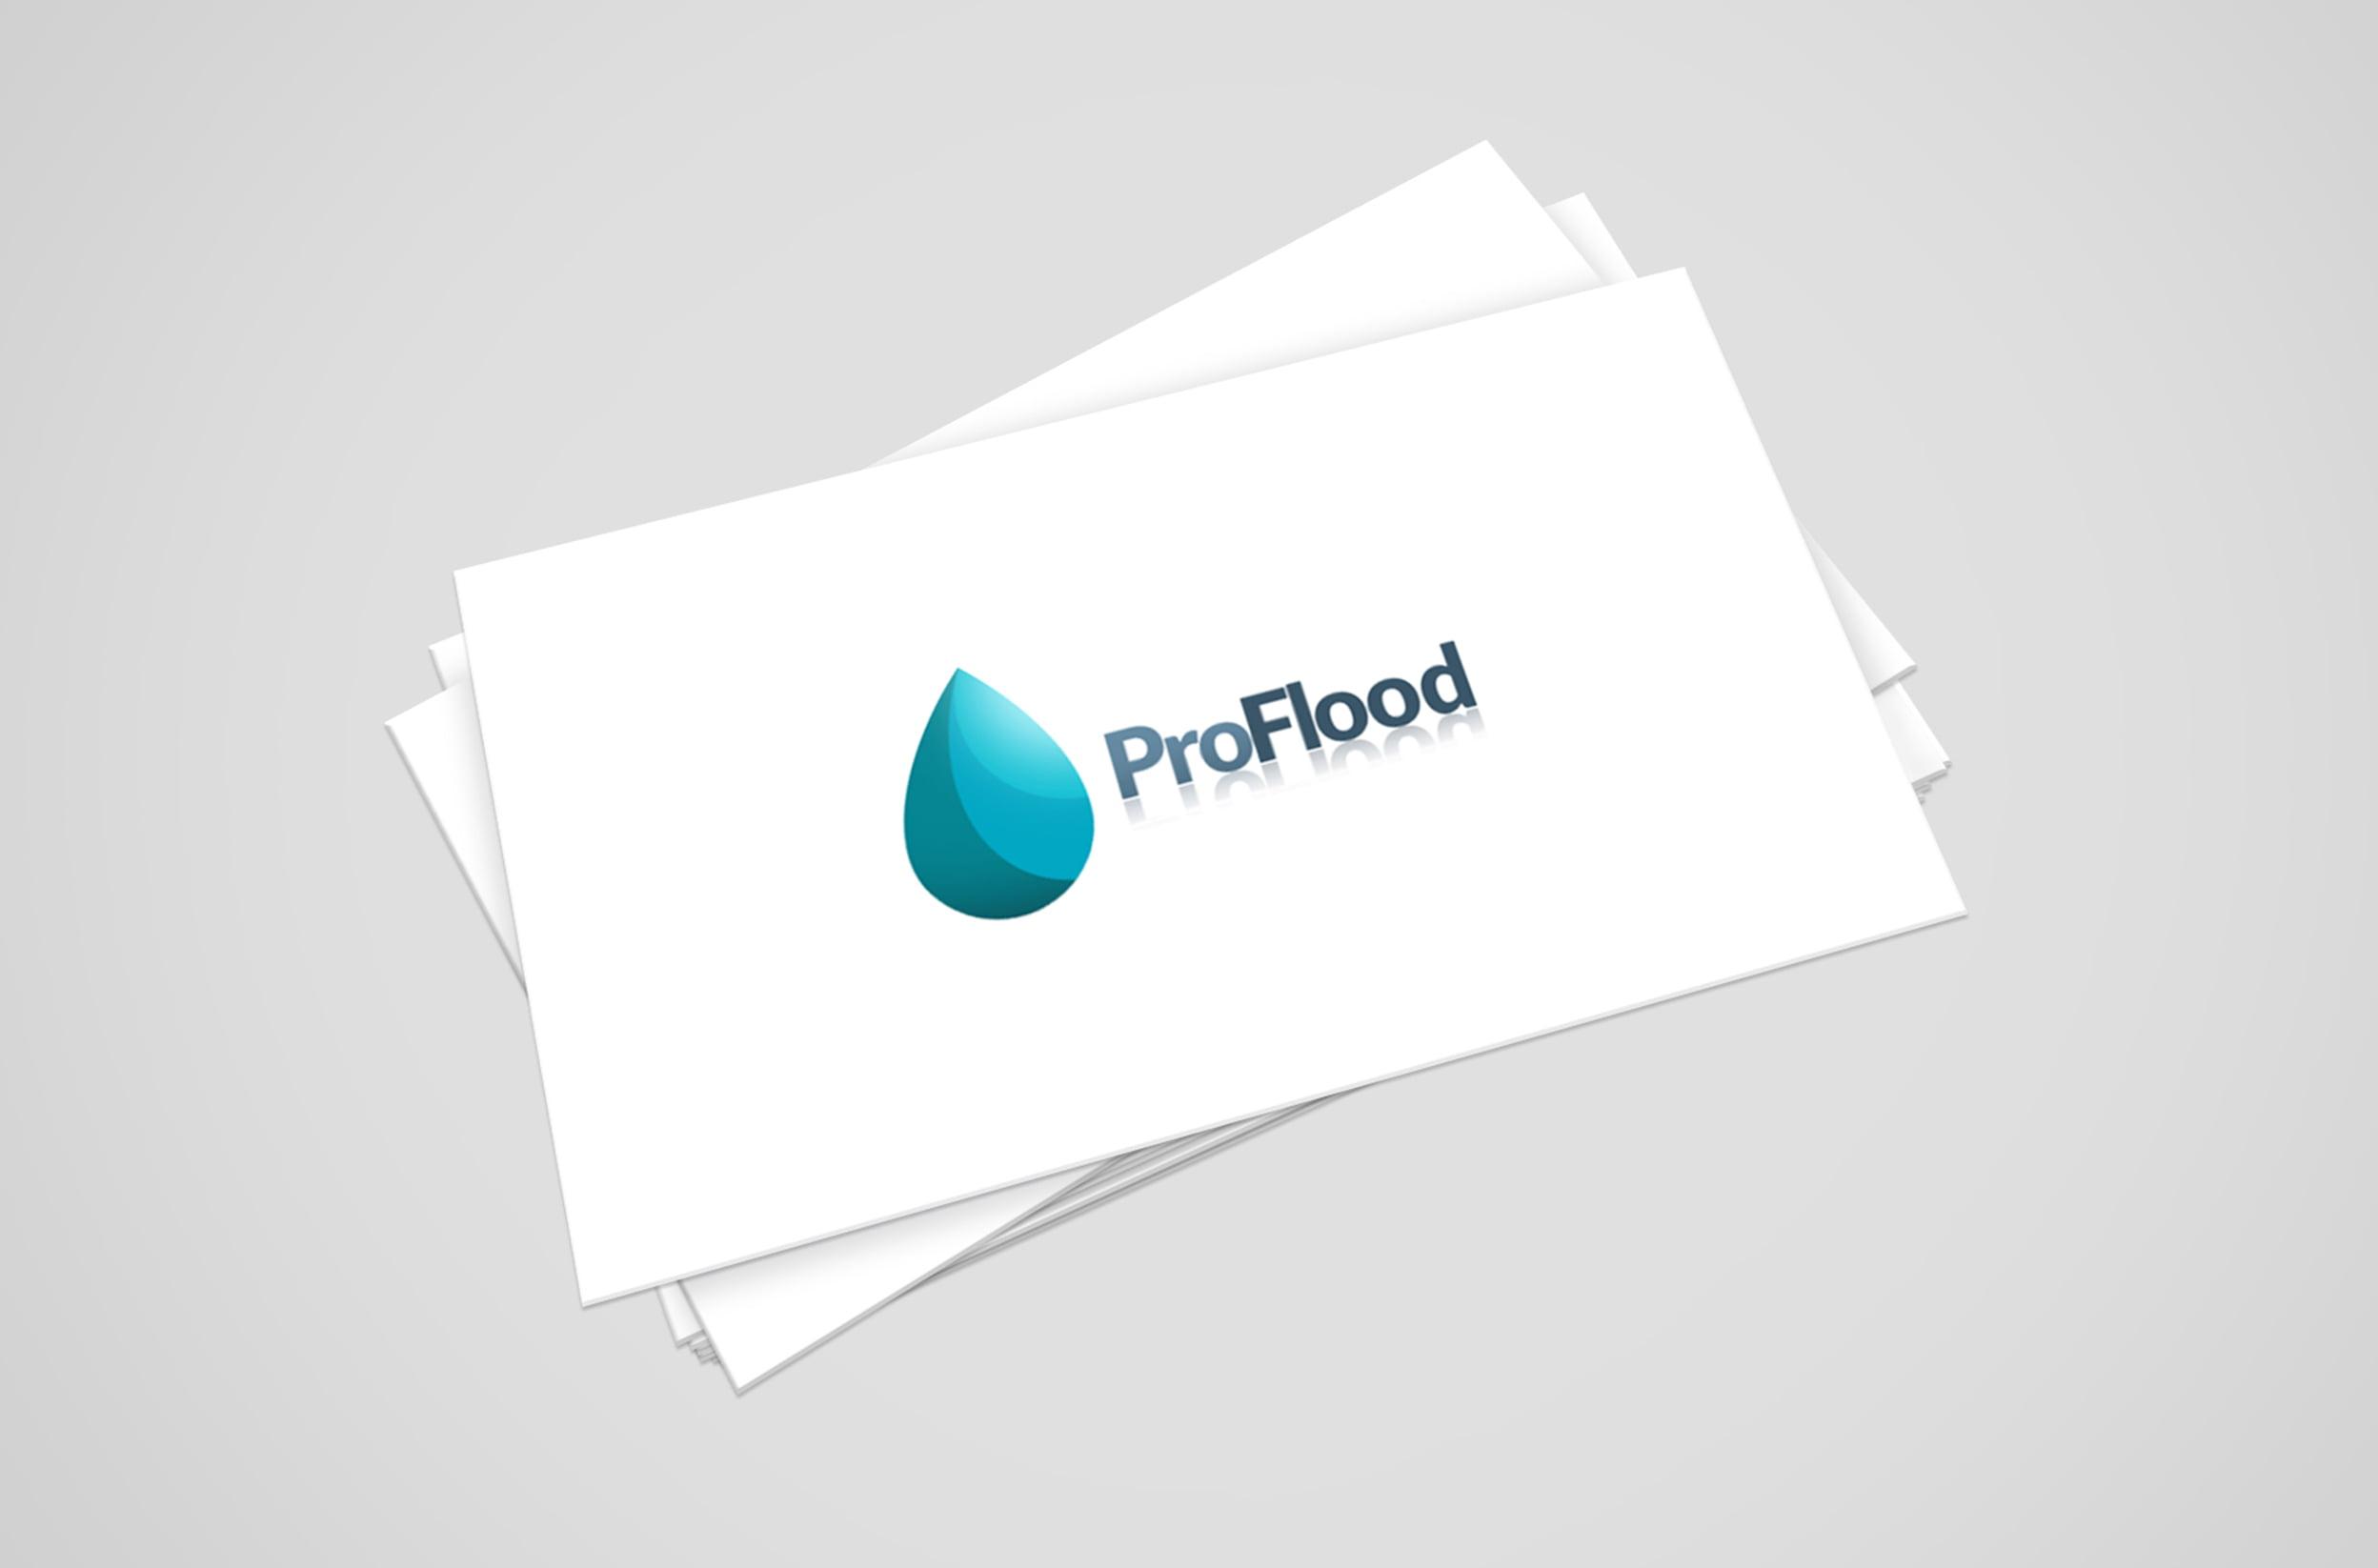 proflood-2